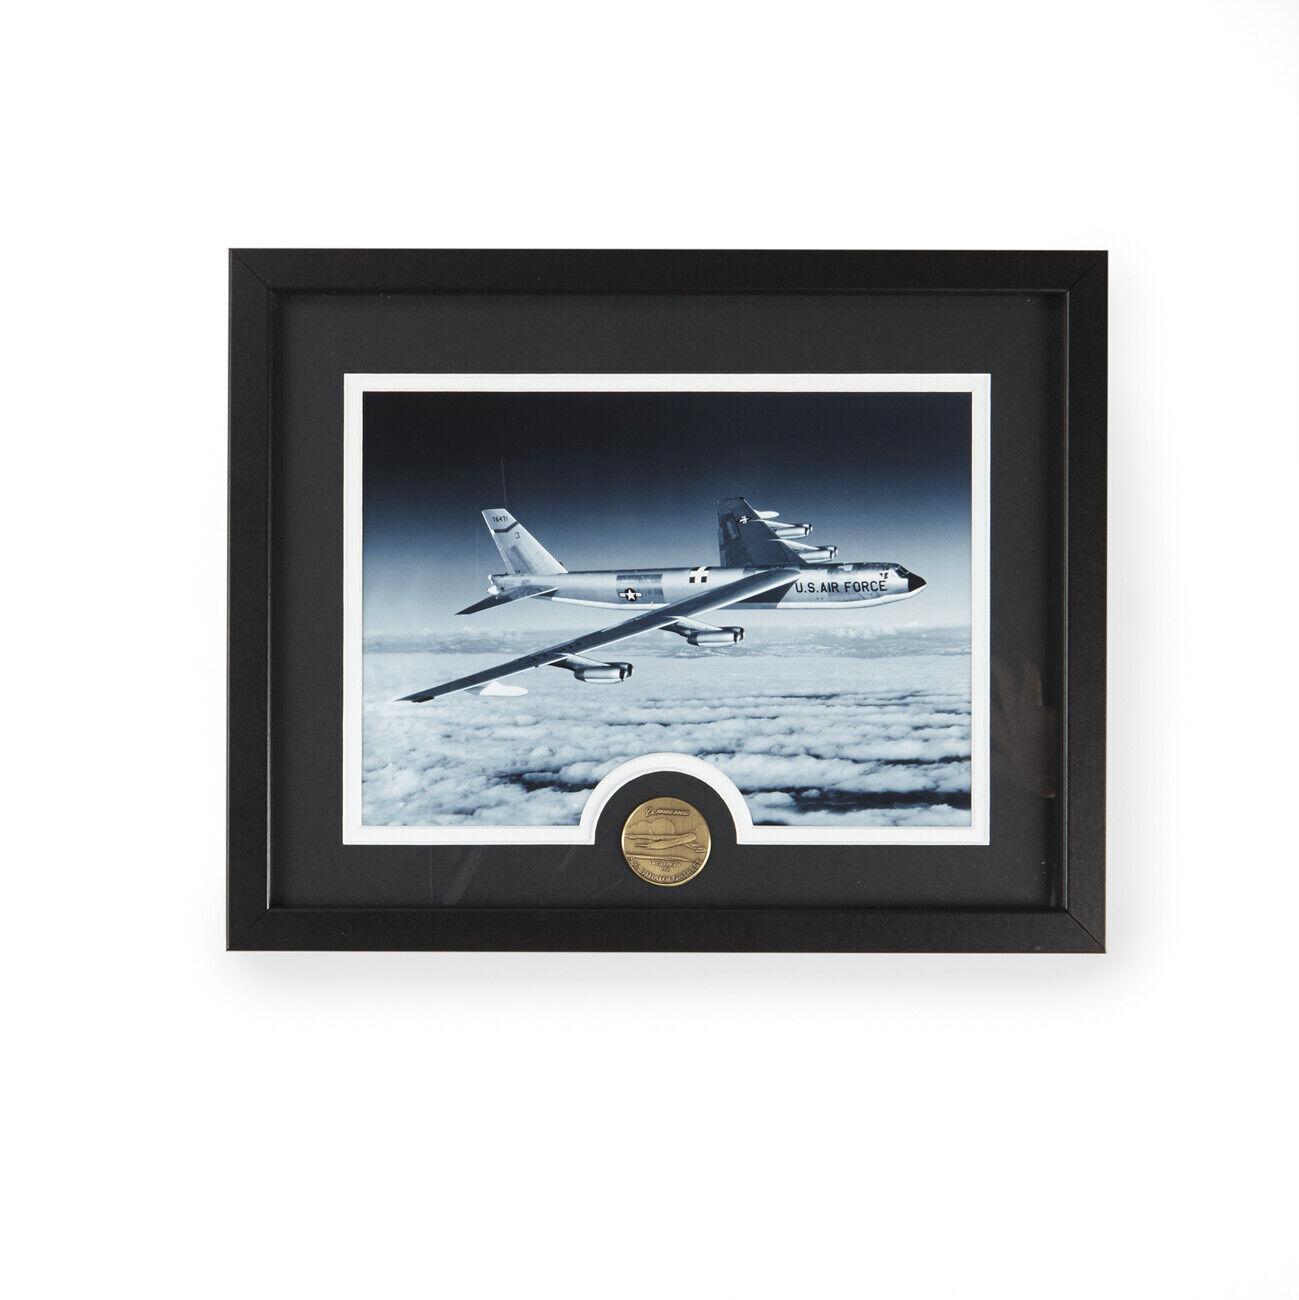 Boeing Centennial Heritage B-52 B-52 Stratofortress Limited Edition Wandbild